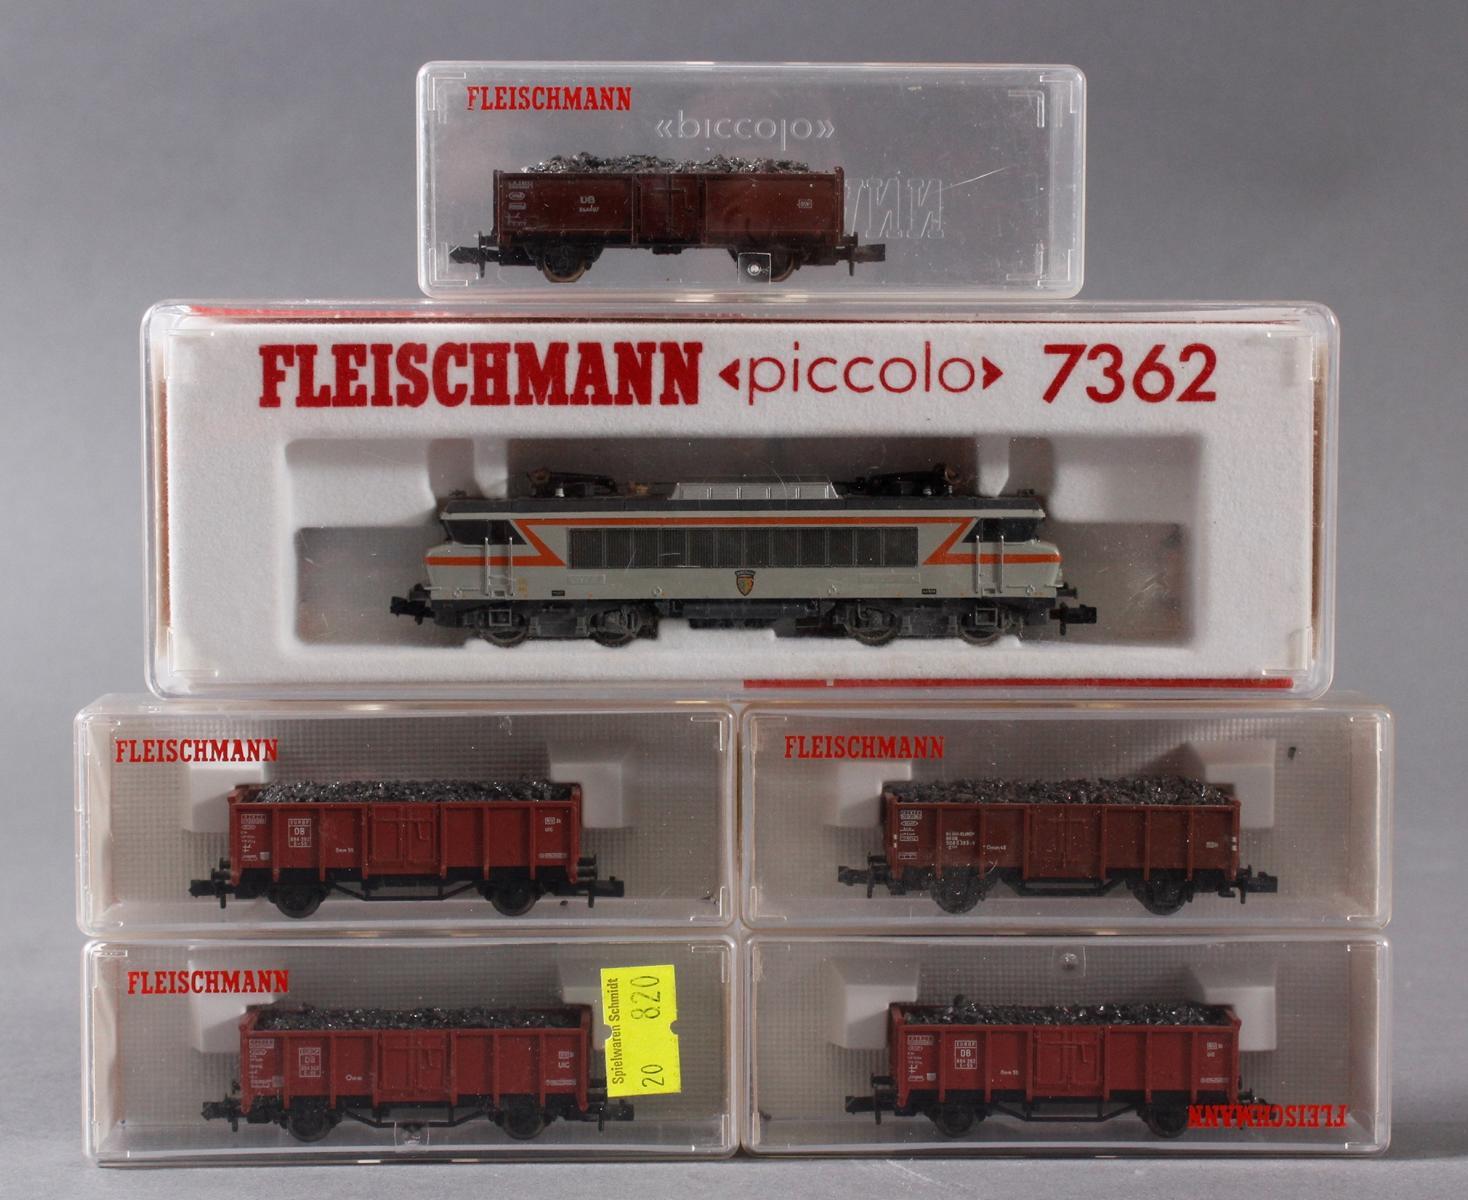 Fleischmann E-Lok 7362 mit 5 Güterwaggons